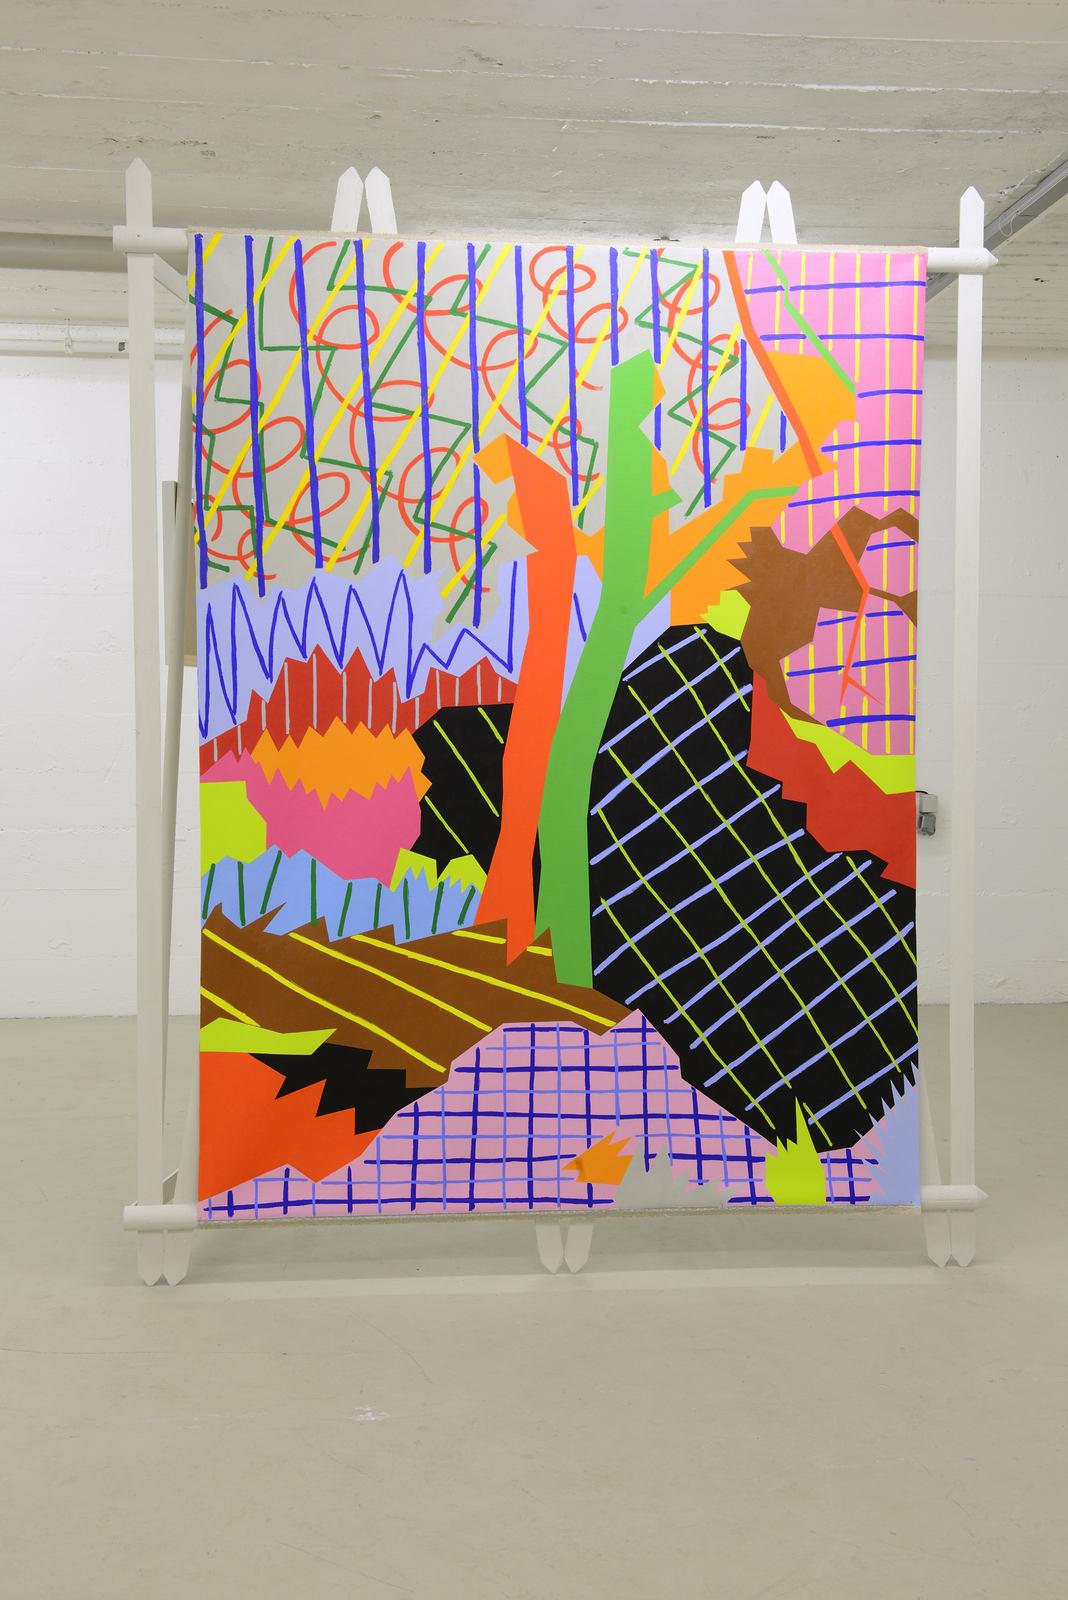 Leen Voet, Kunstbunker 7